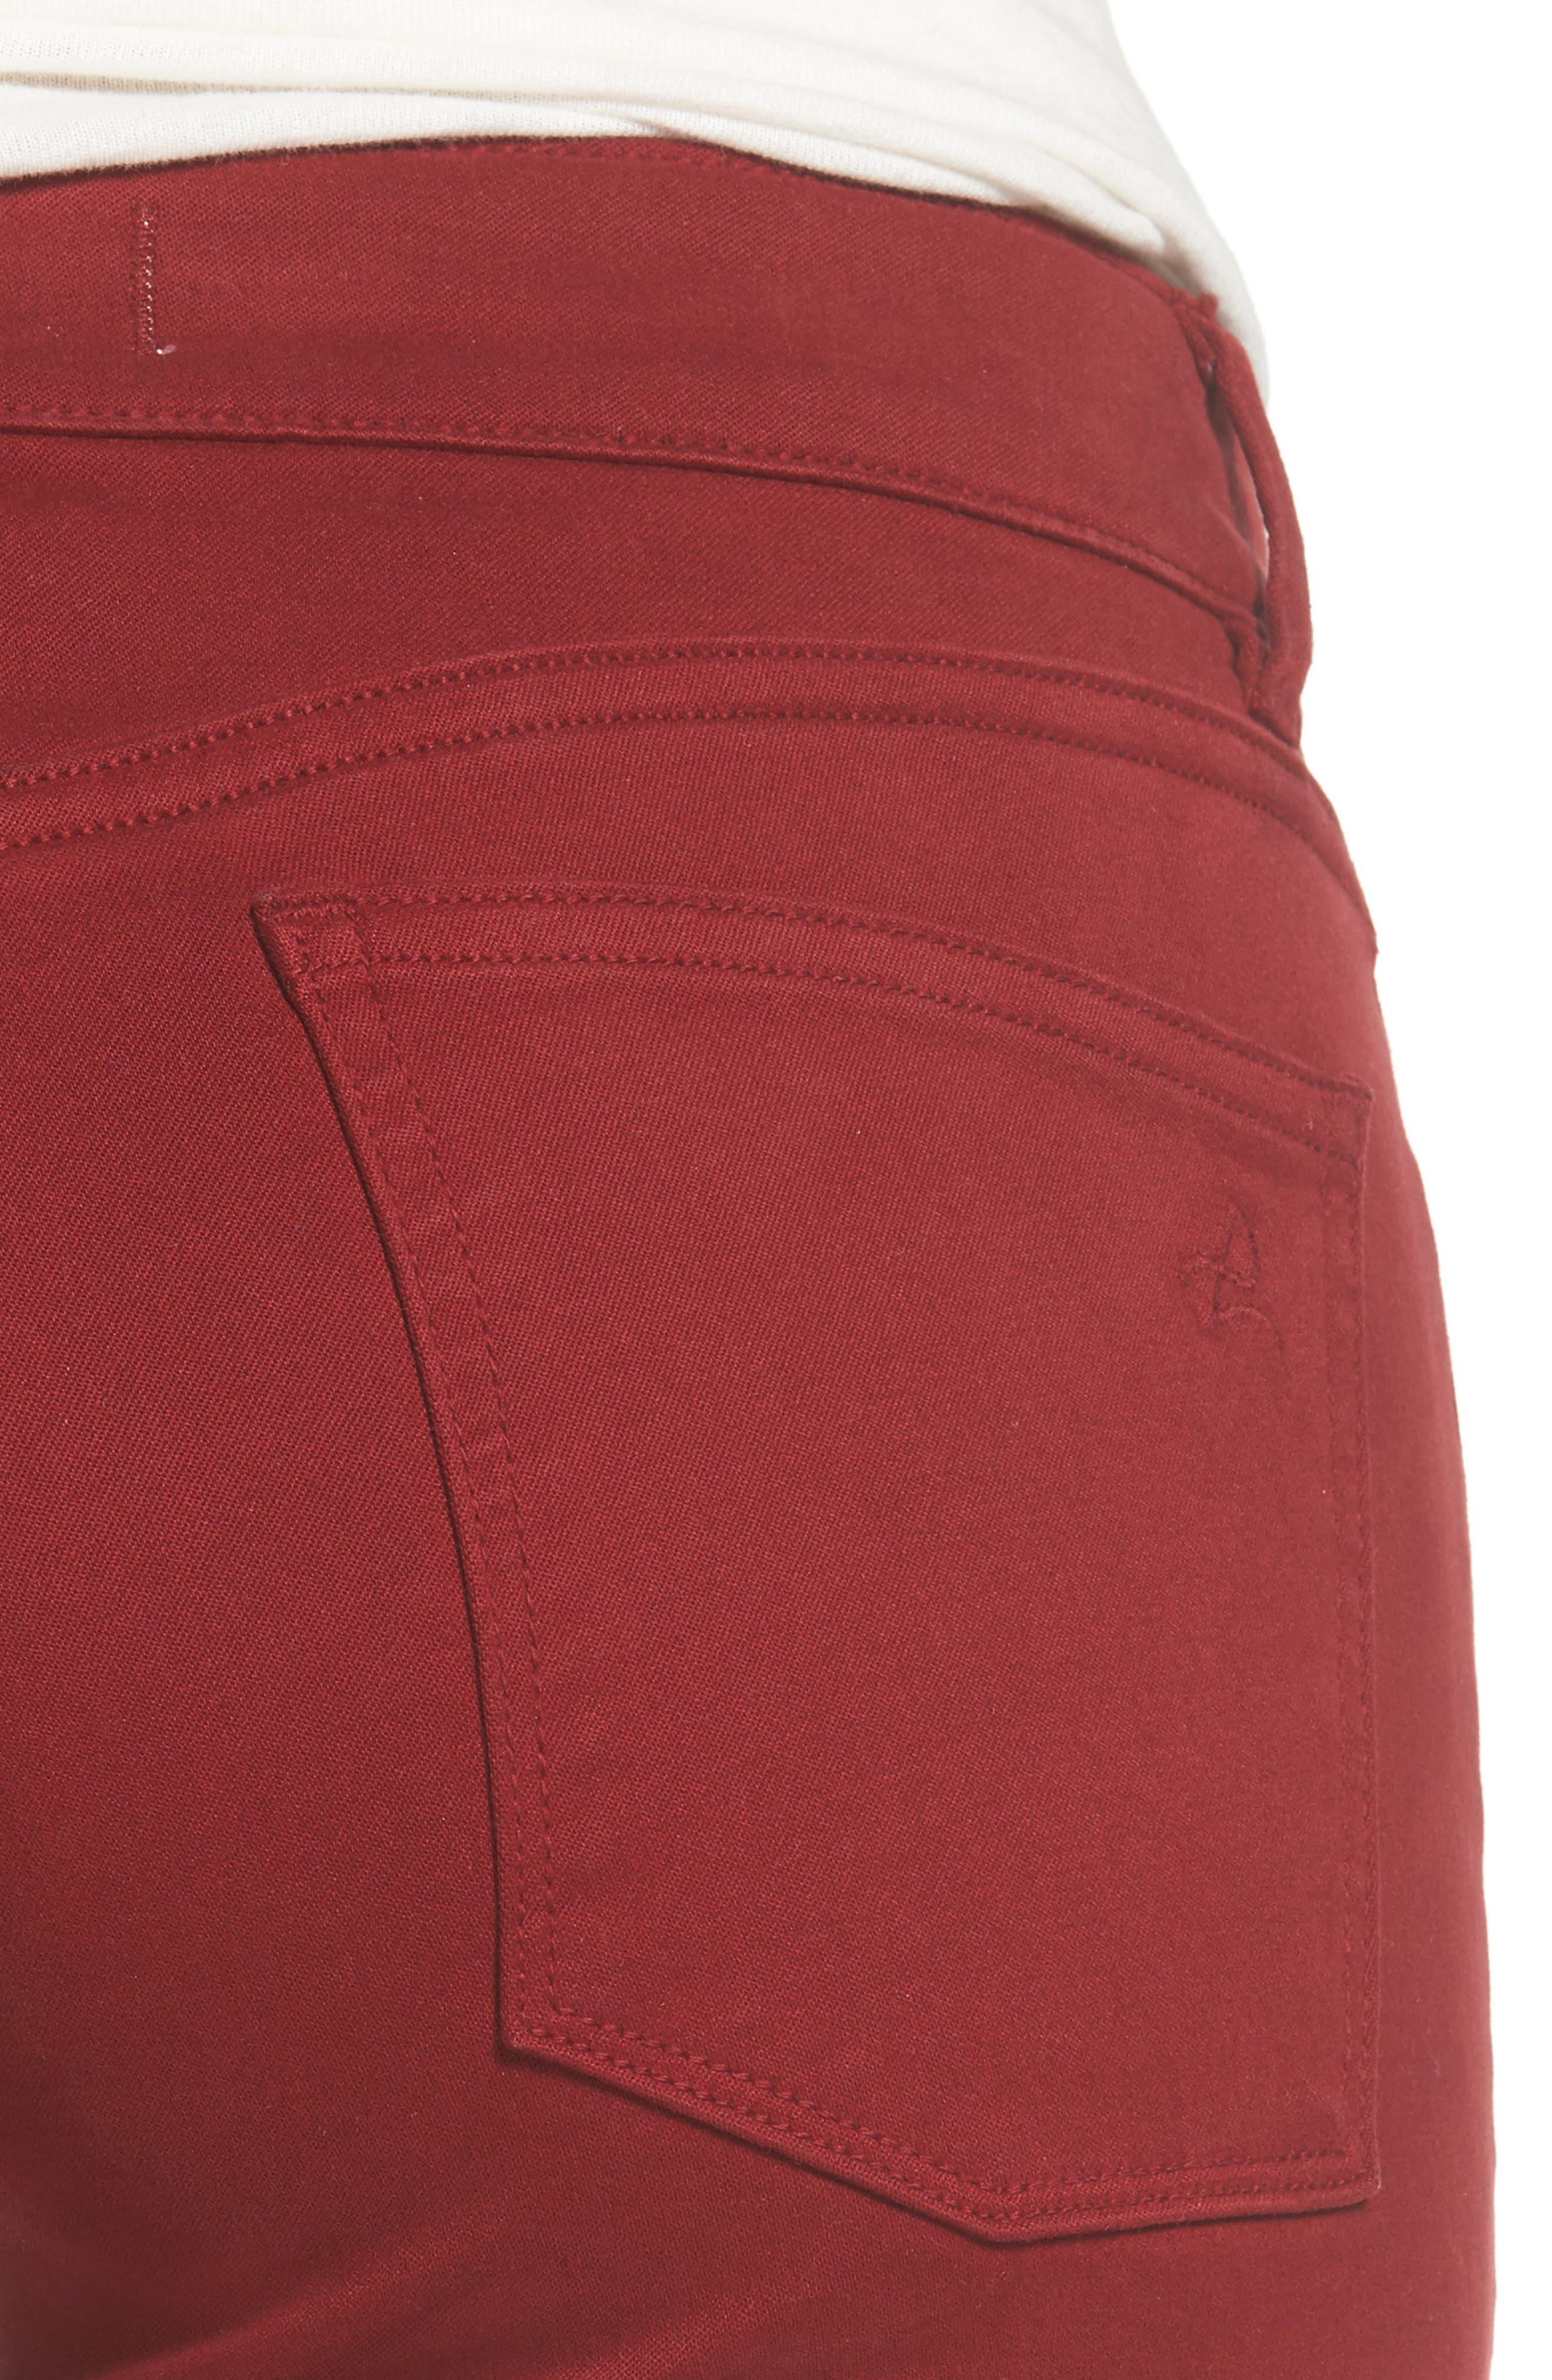 Alternate Image 4  - DL1961 Emma Power Legging Jeans (Rhubarb)